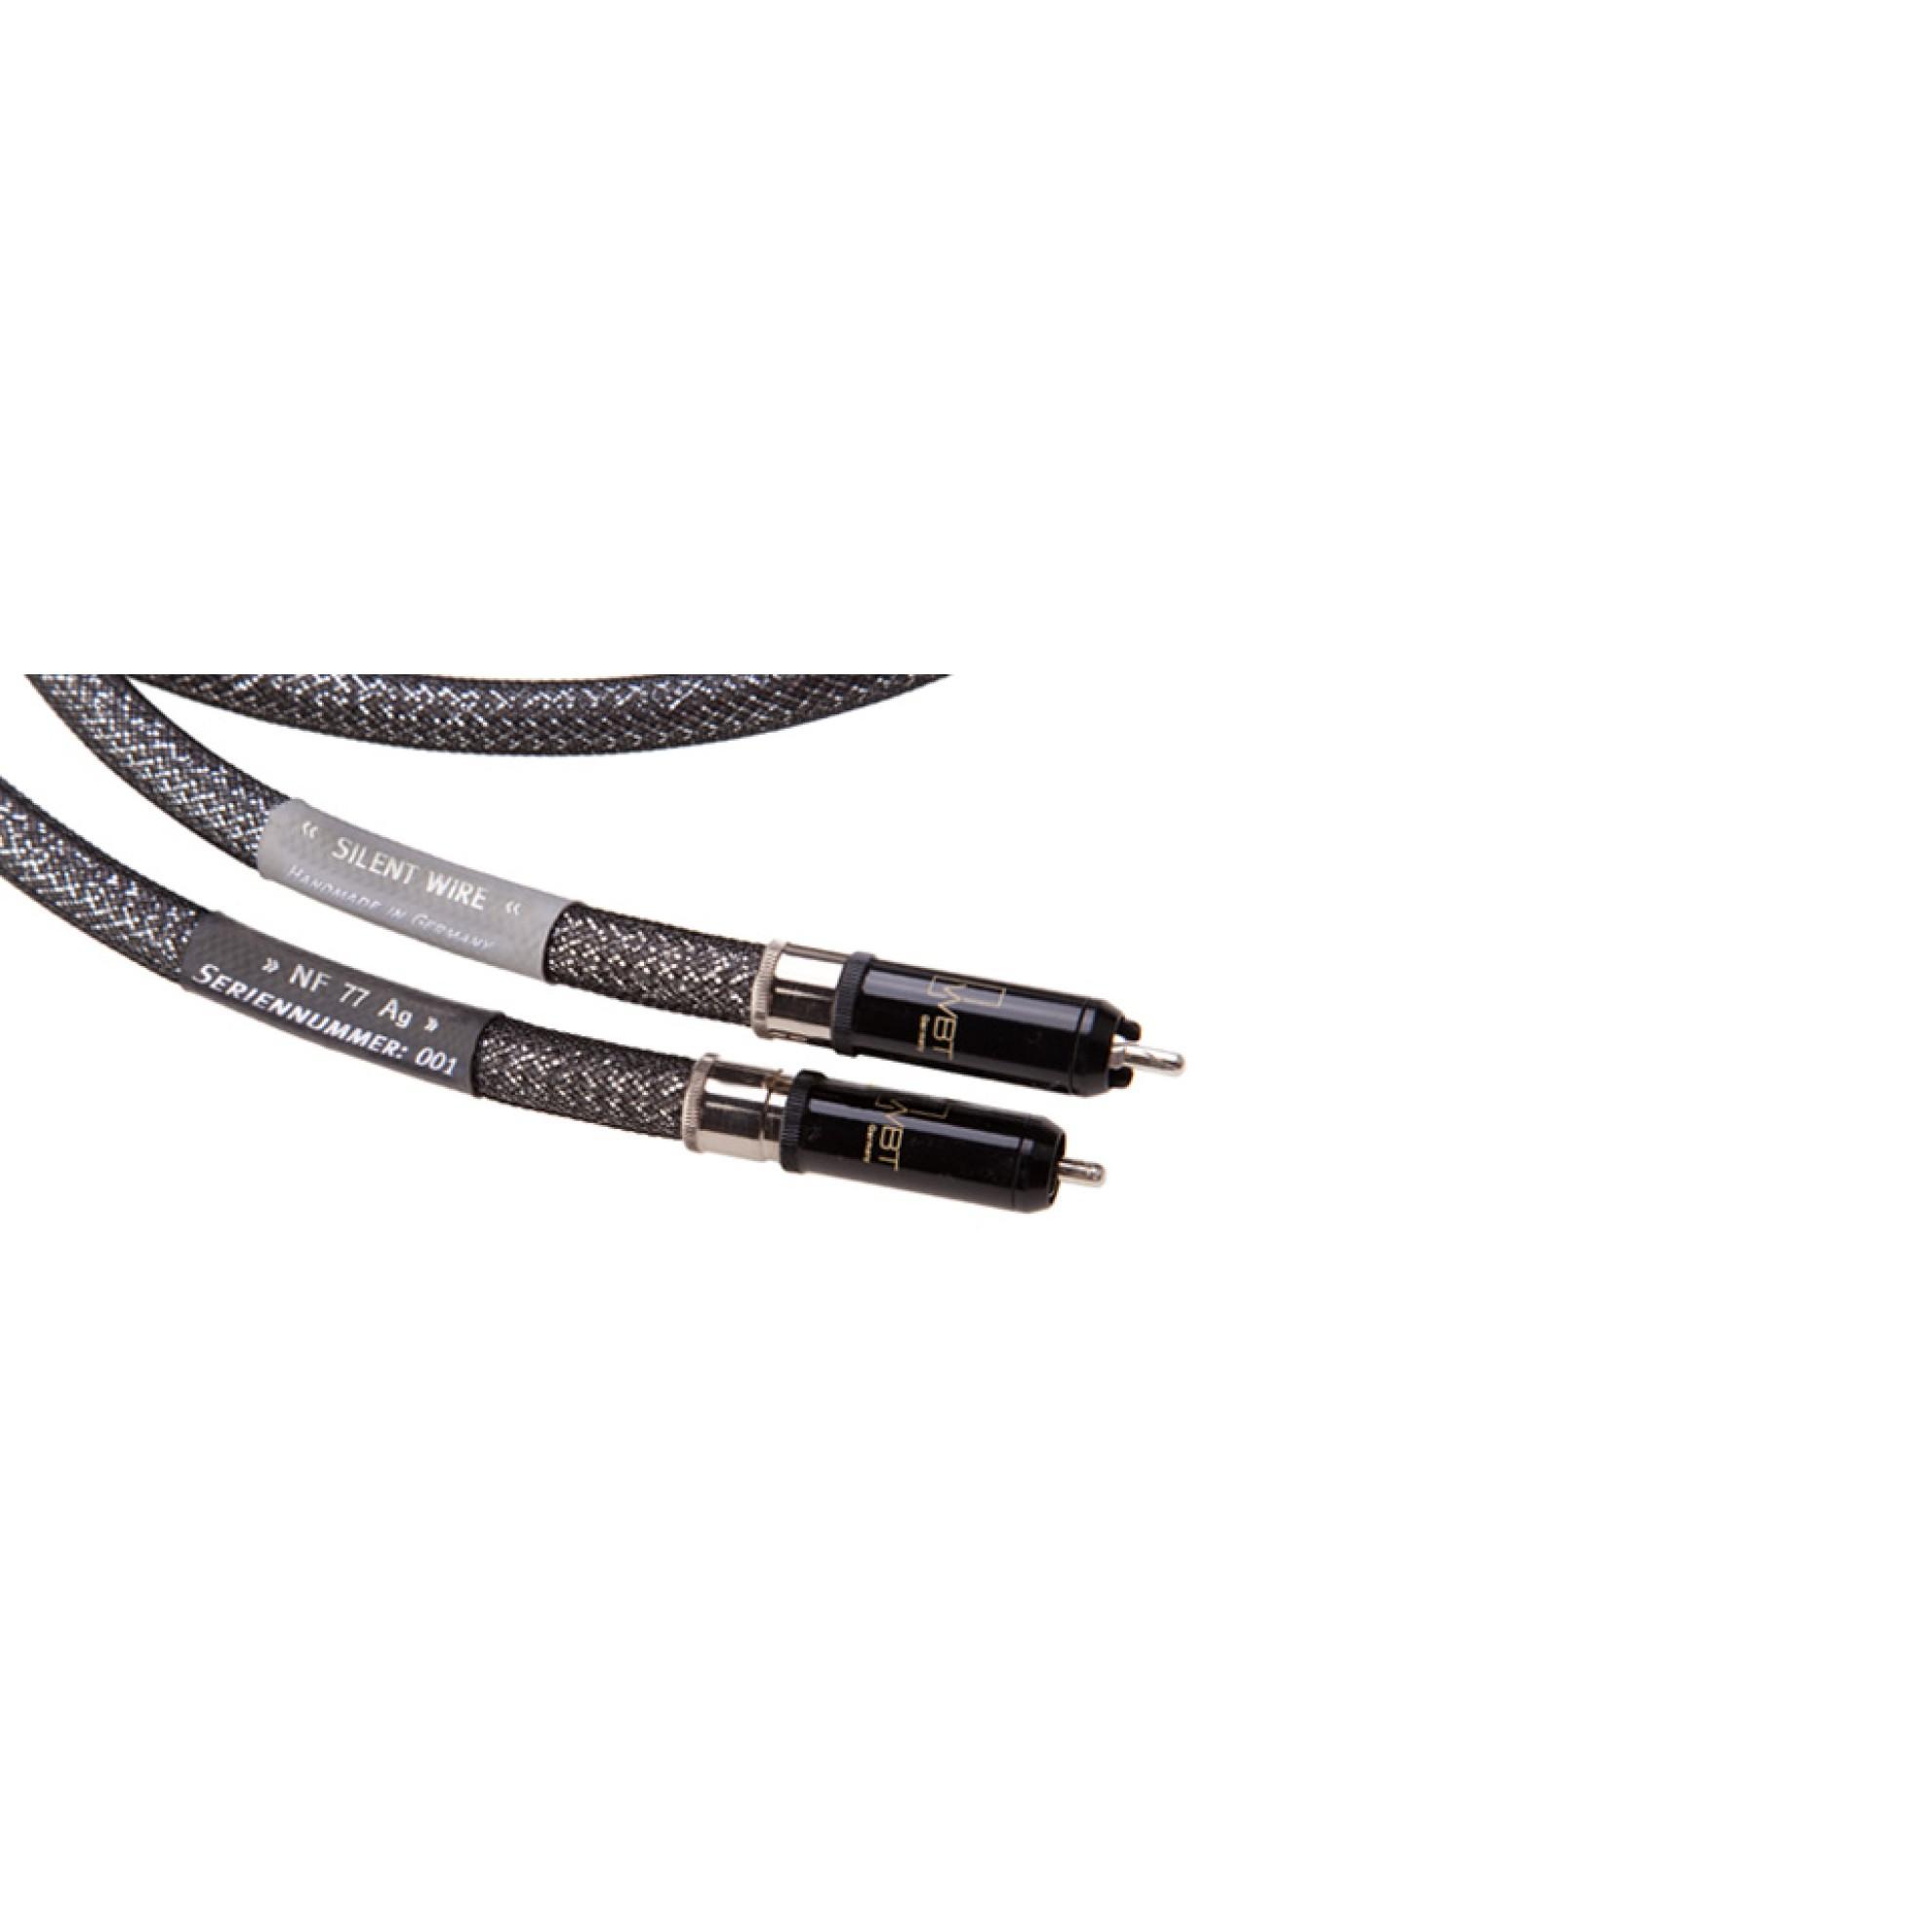 Silent Wire Nf77 Ag Xlr Kabel